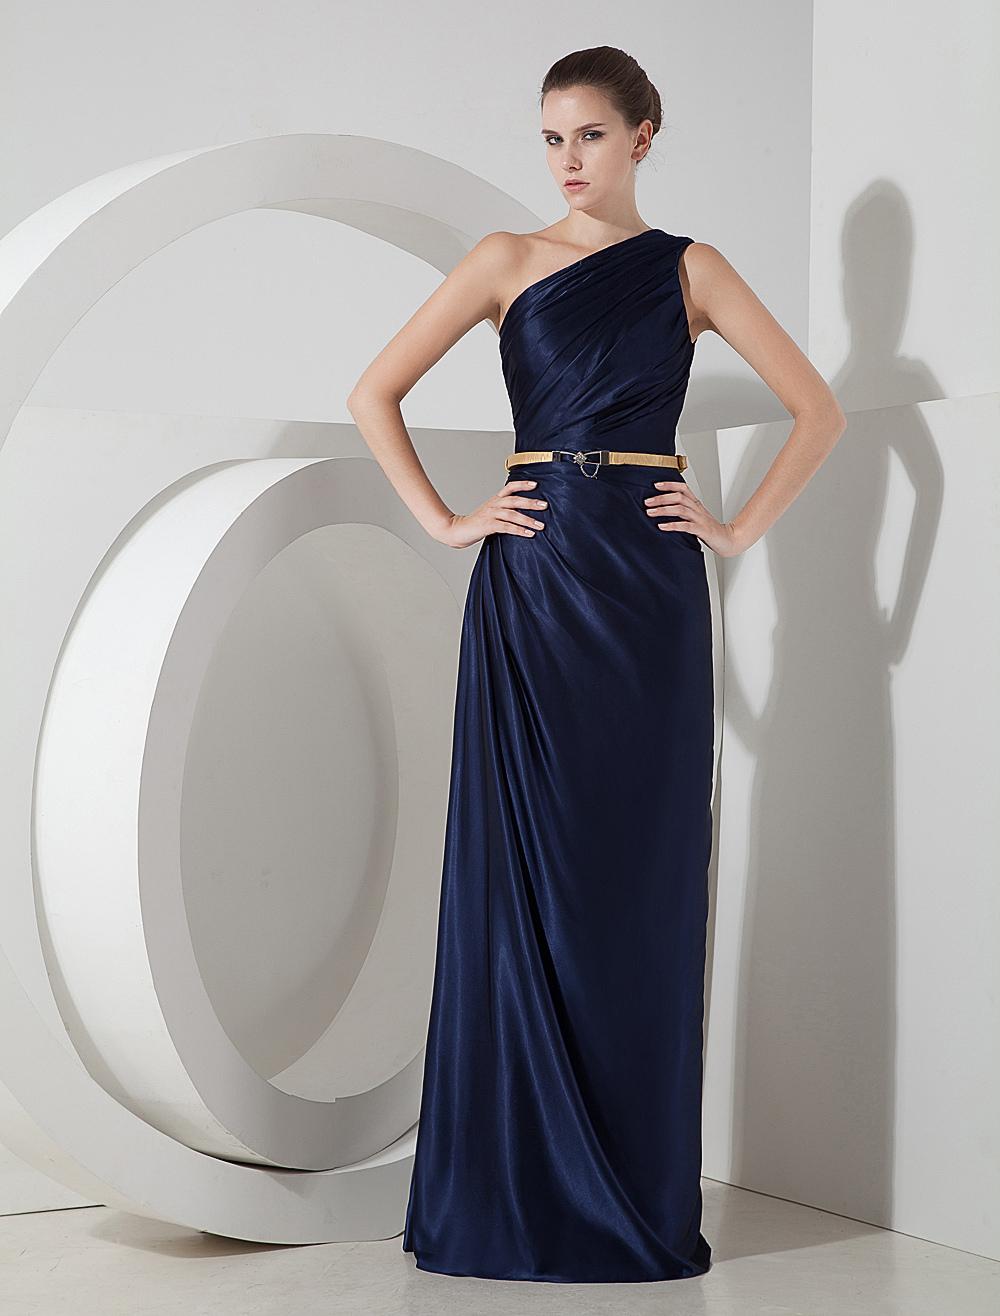 Deep Blue One-Shoulder Elastic Silk Like Satin Evening Dress (Wedding Evening Dresses) photo